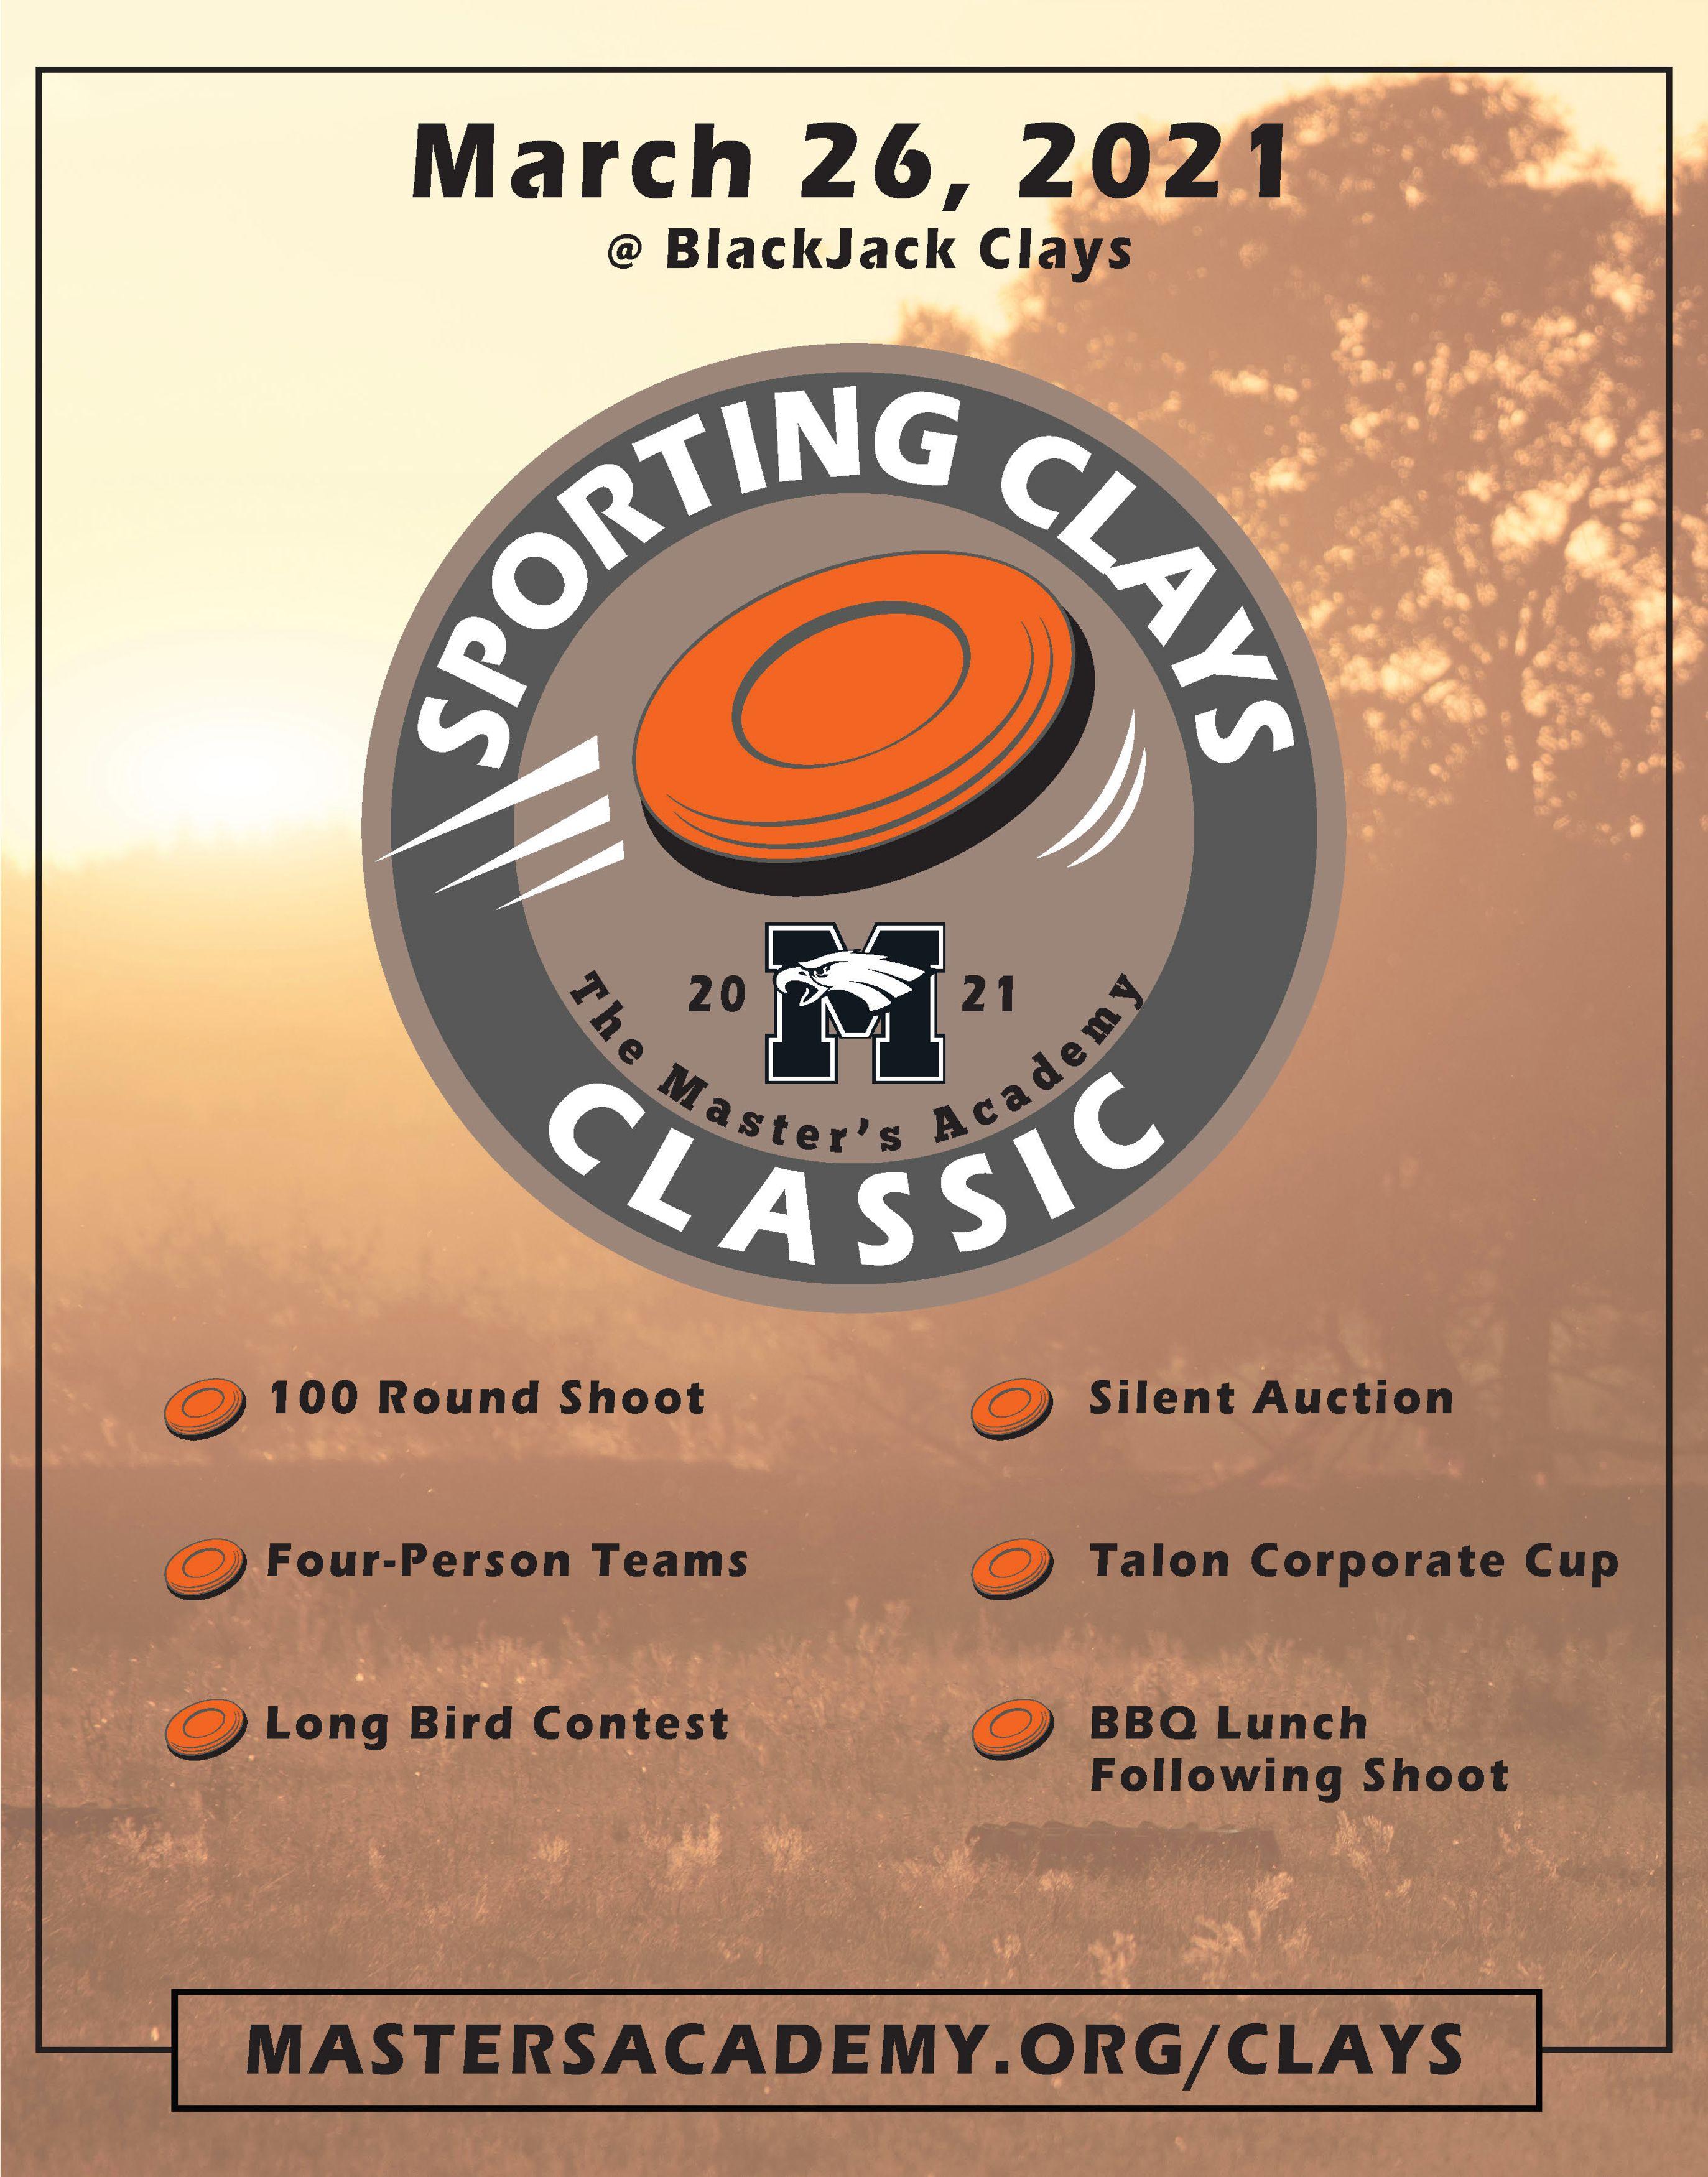 TMA Sporting Clays Classic